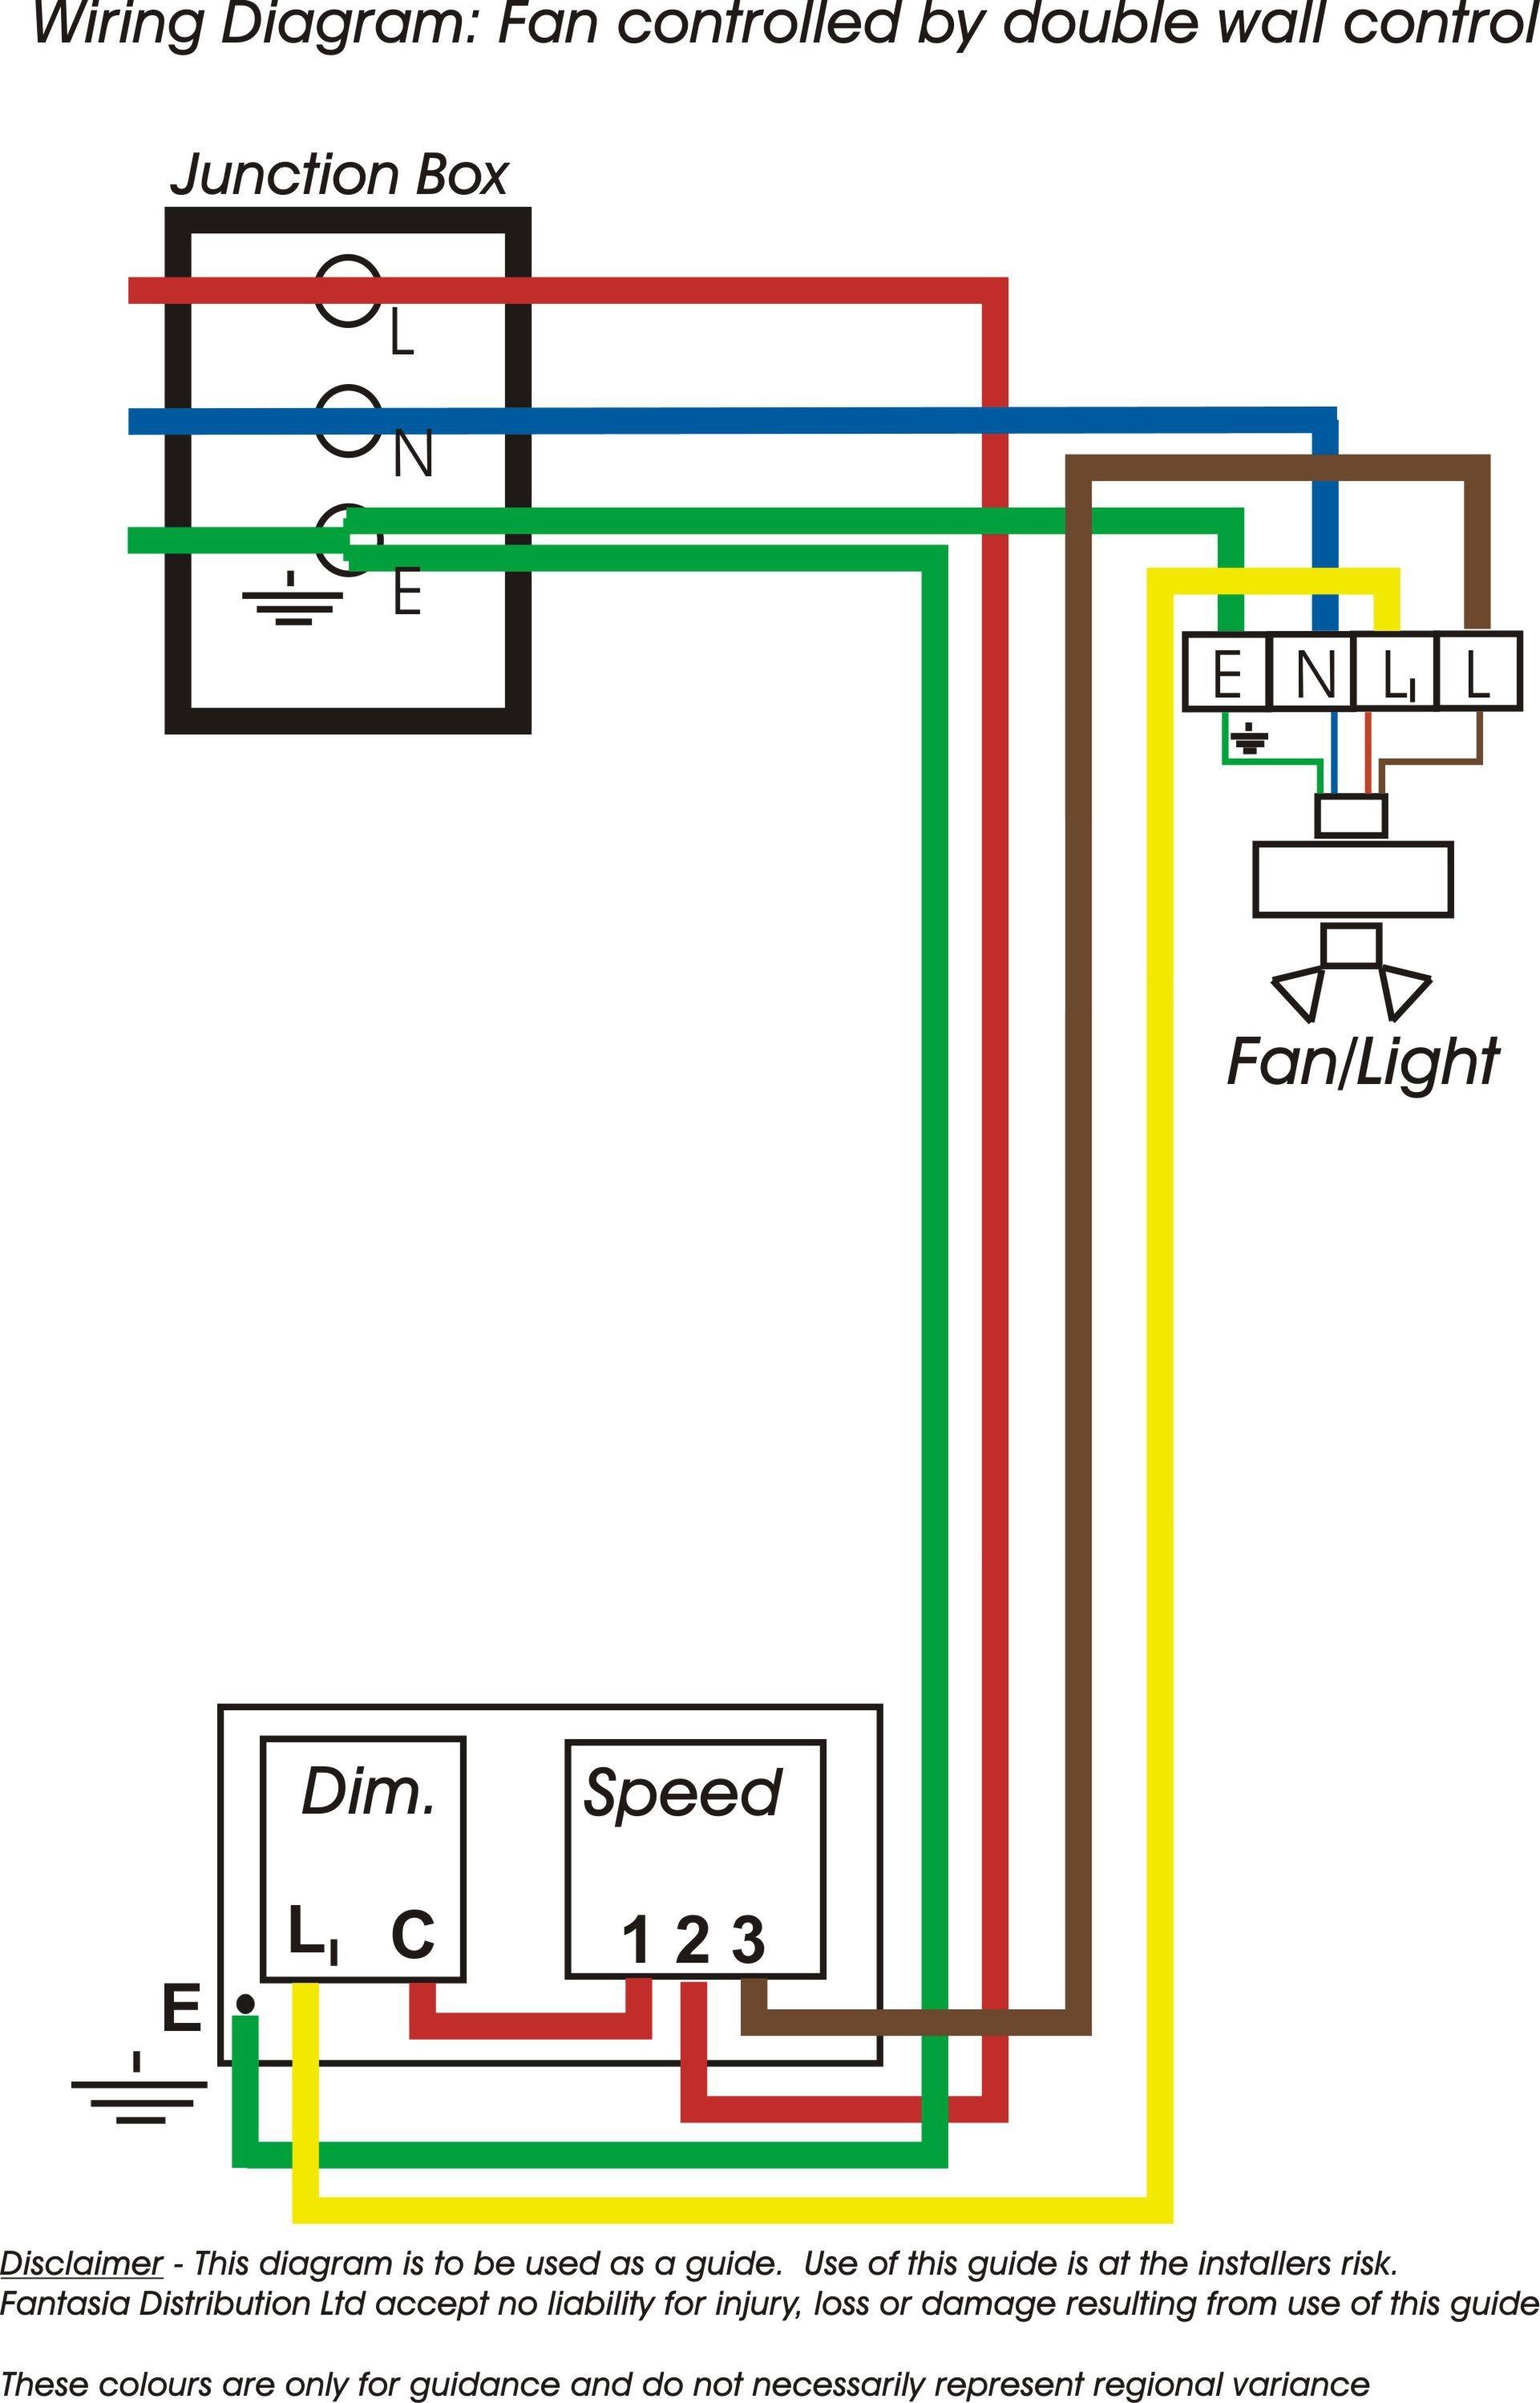 Ceiling Fan Wall Switch Wiring Diagram Unique 3 Speed Ceiling Fan Switch Wiring Diagram Diagram Of Ceiling Fan Wall Switch Wiring Diagram